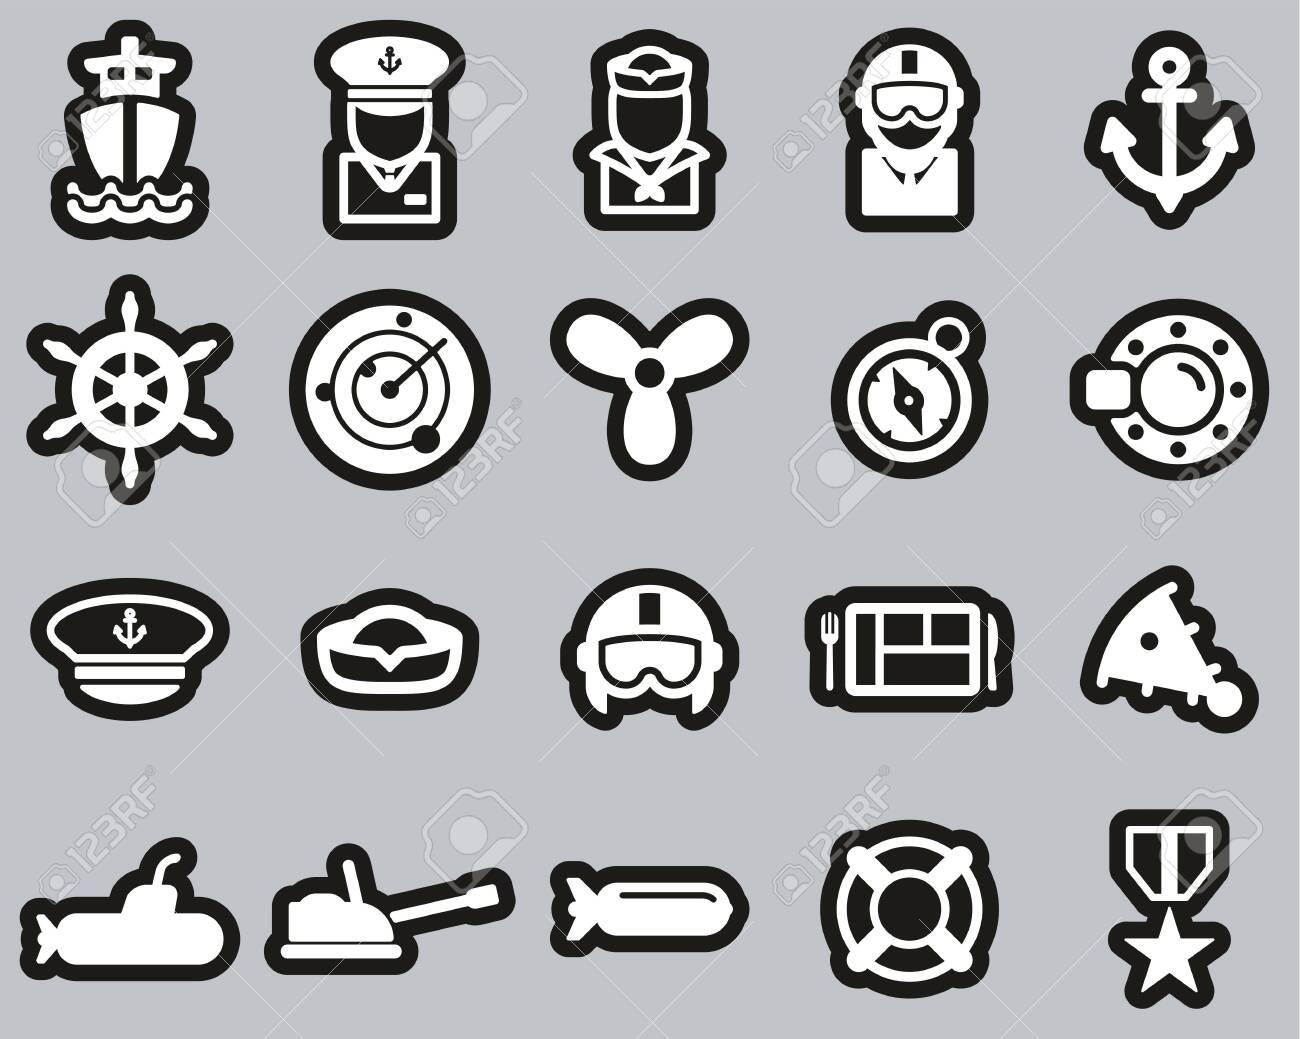 Navy Icons White On White Sticker Set Big - 138785698